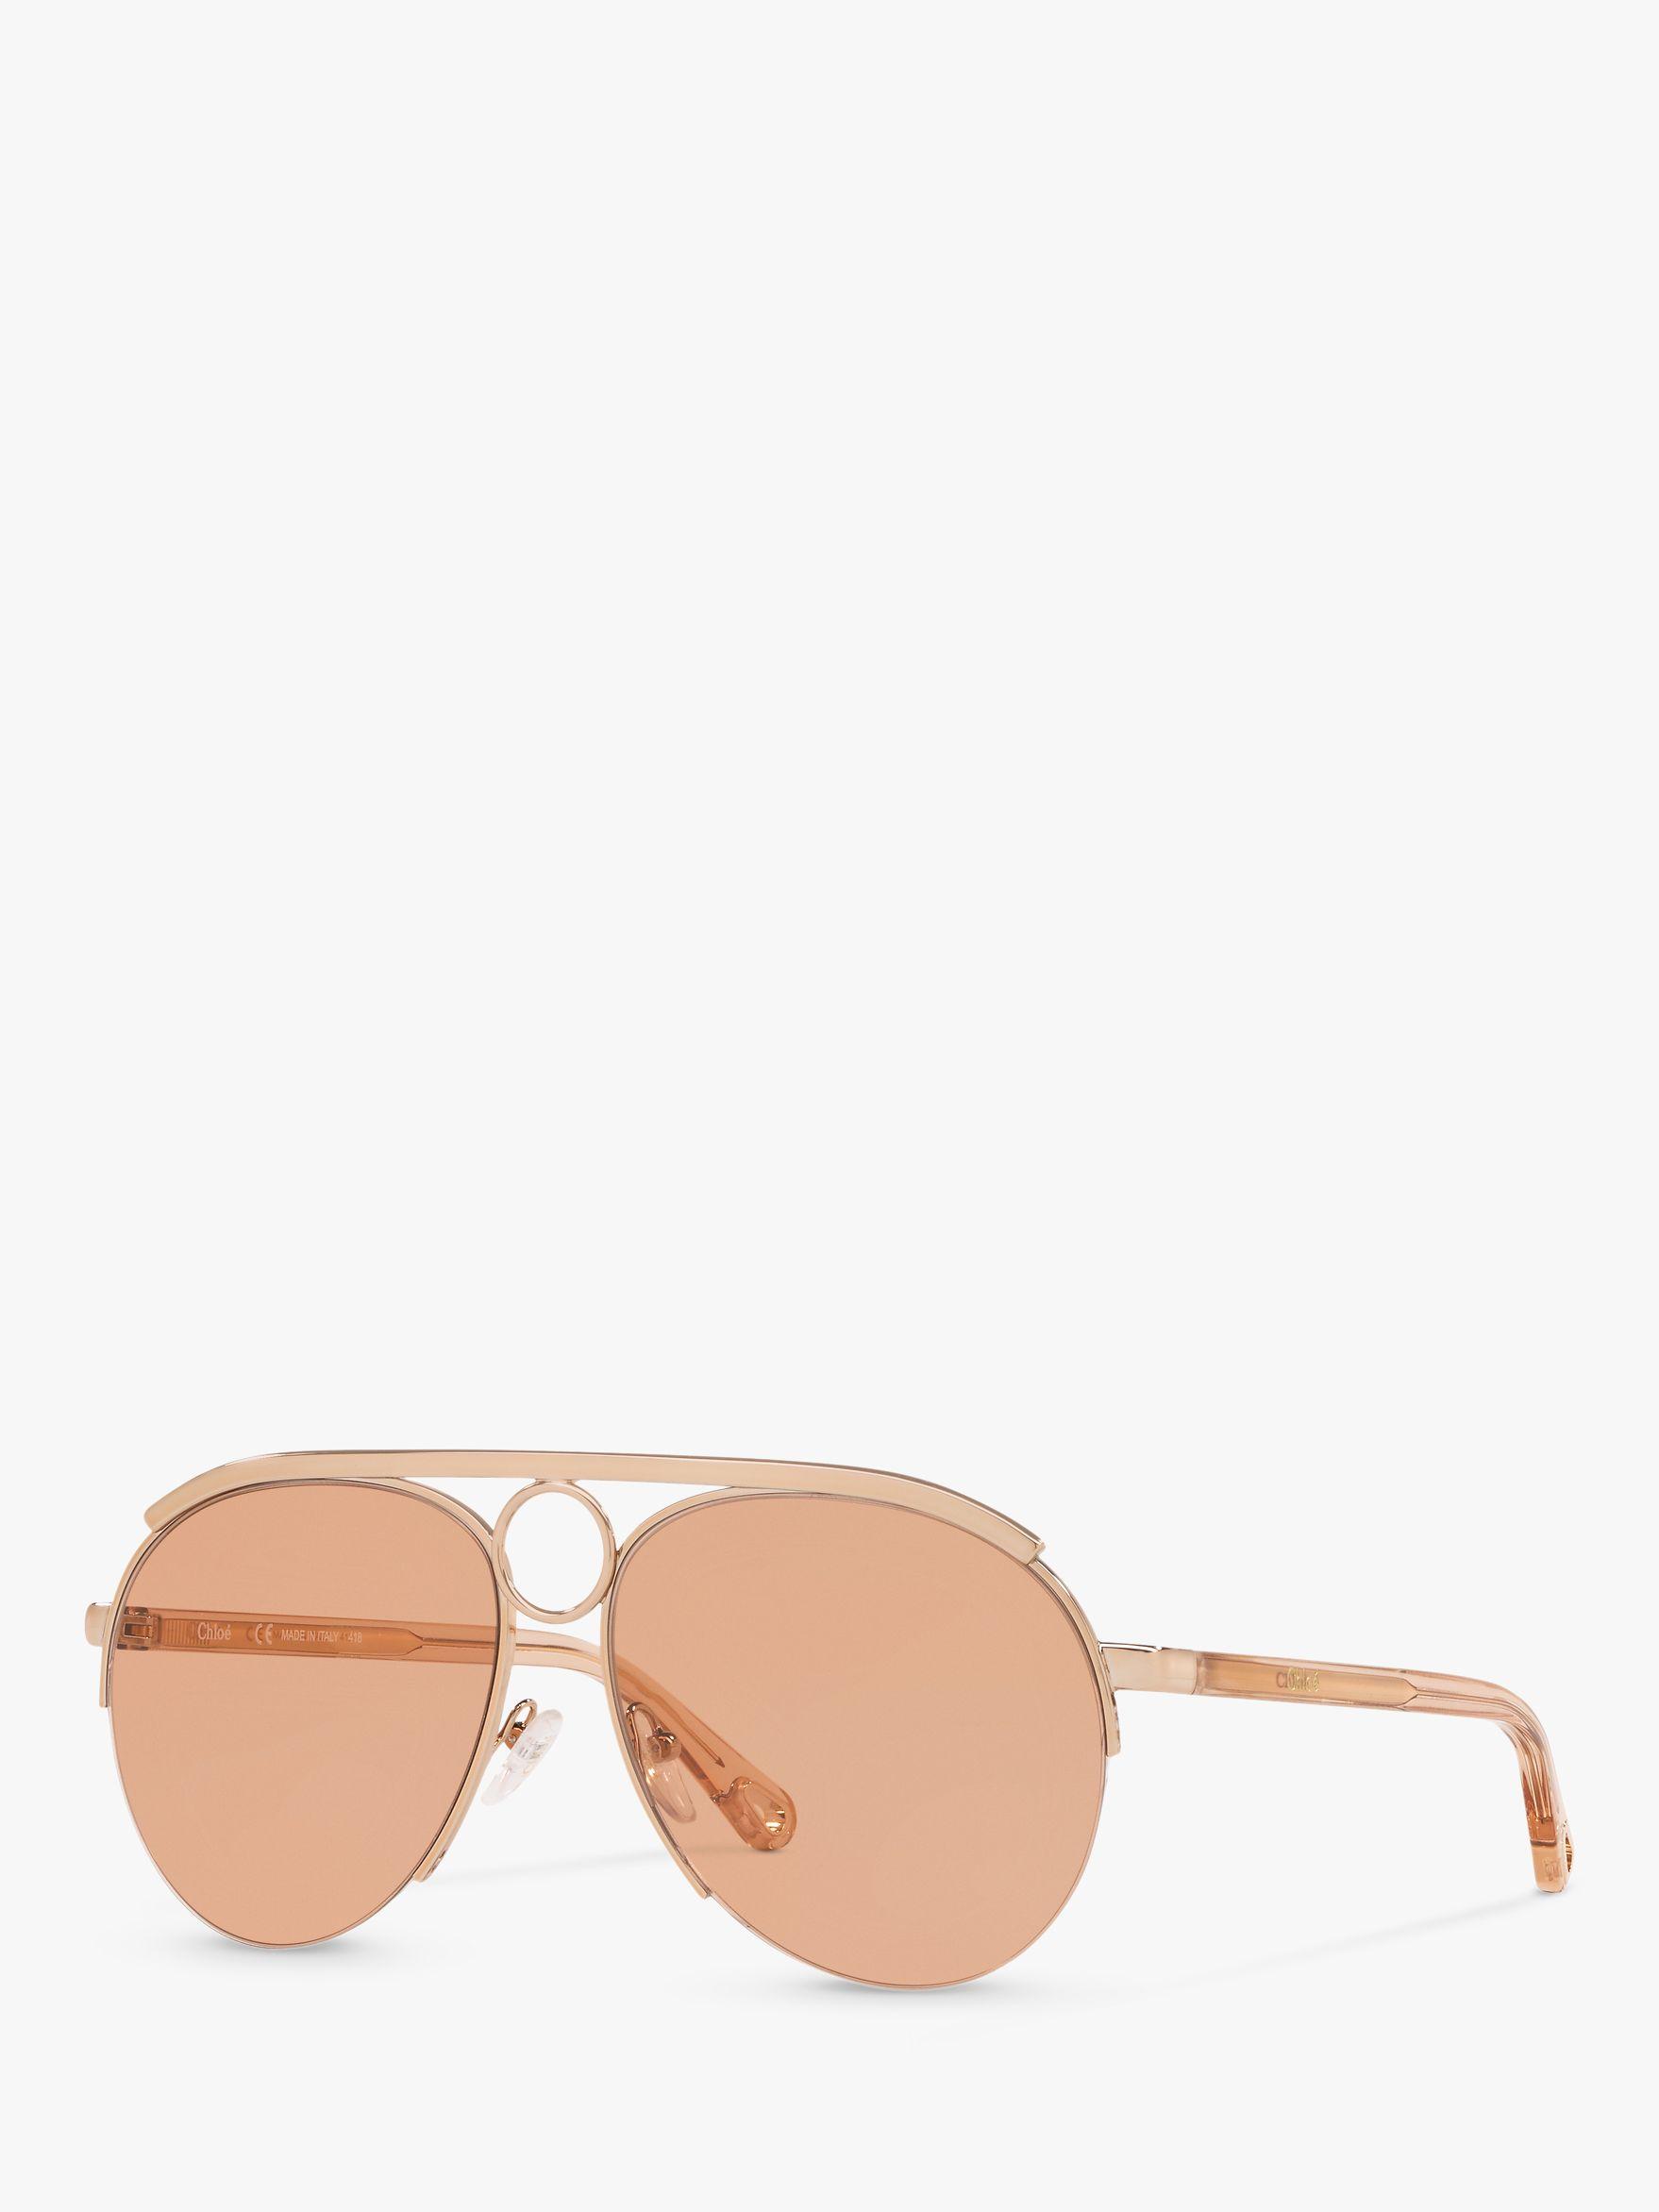 Chloe Chloé CE152S Women's Aviator Sunglasses